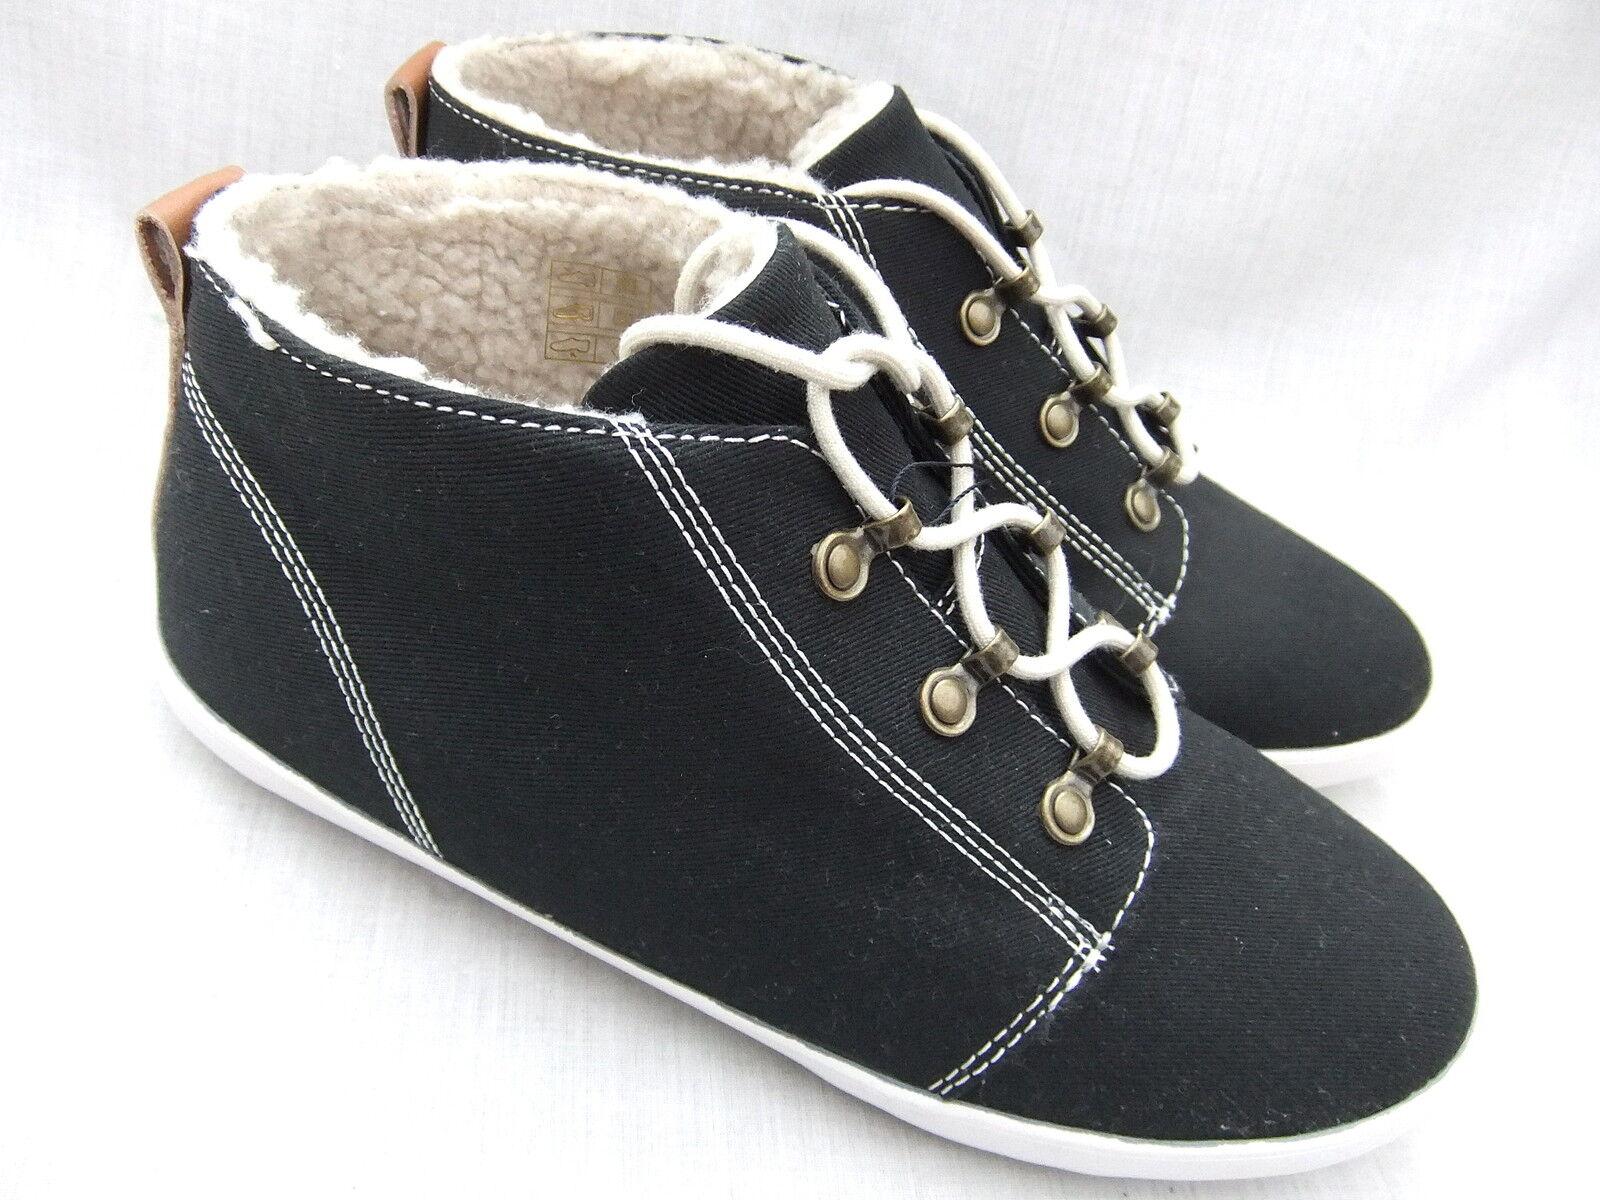 NEW FROT PERRY Damenschuhe Stiefel B1097W GLOBE TWILL BLACK Stiefel Damenschuhe SIZE 4 EU 37  BNIB ef8eb7